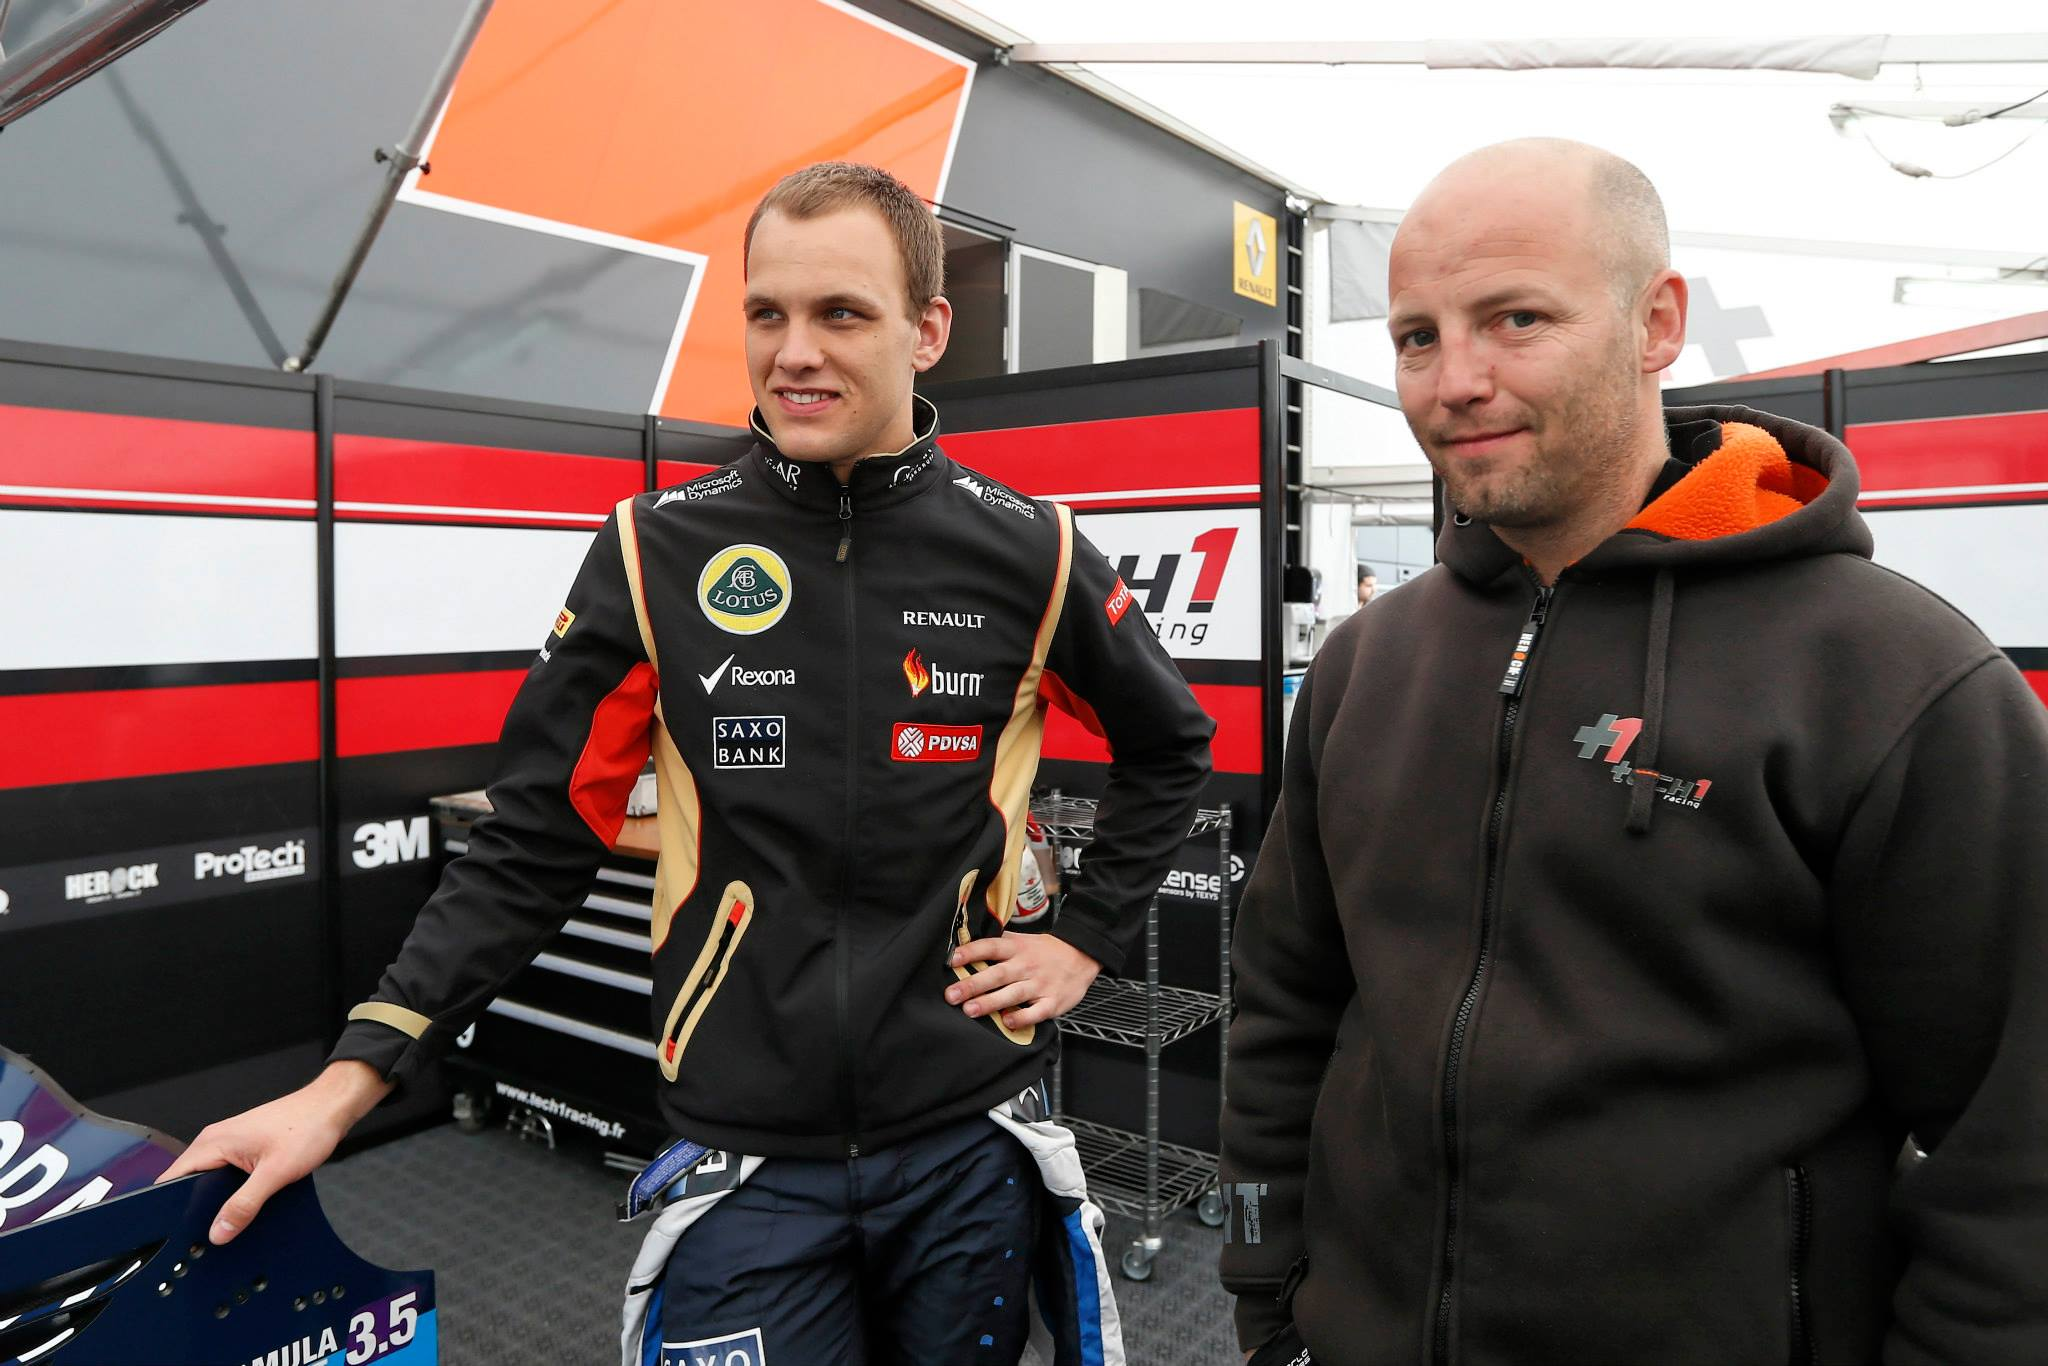 2014 Formula Renault 3.5 Series - Monza - Marcos Sorensen